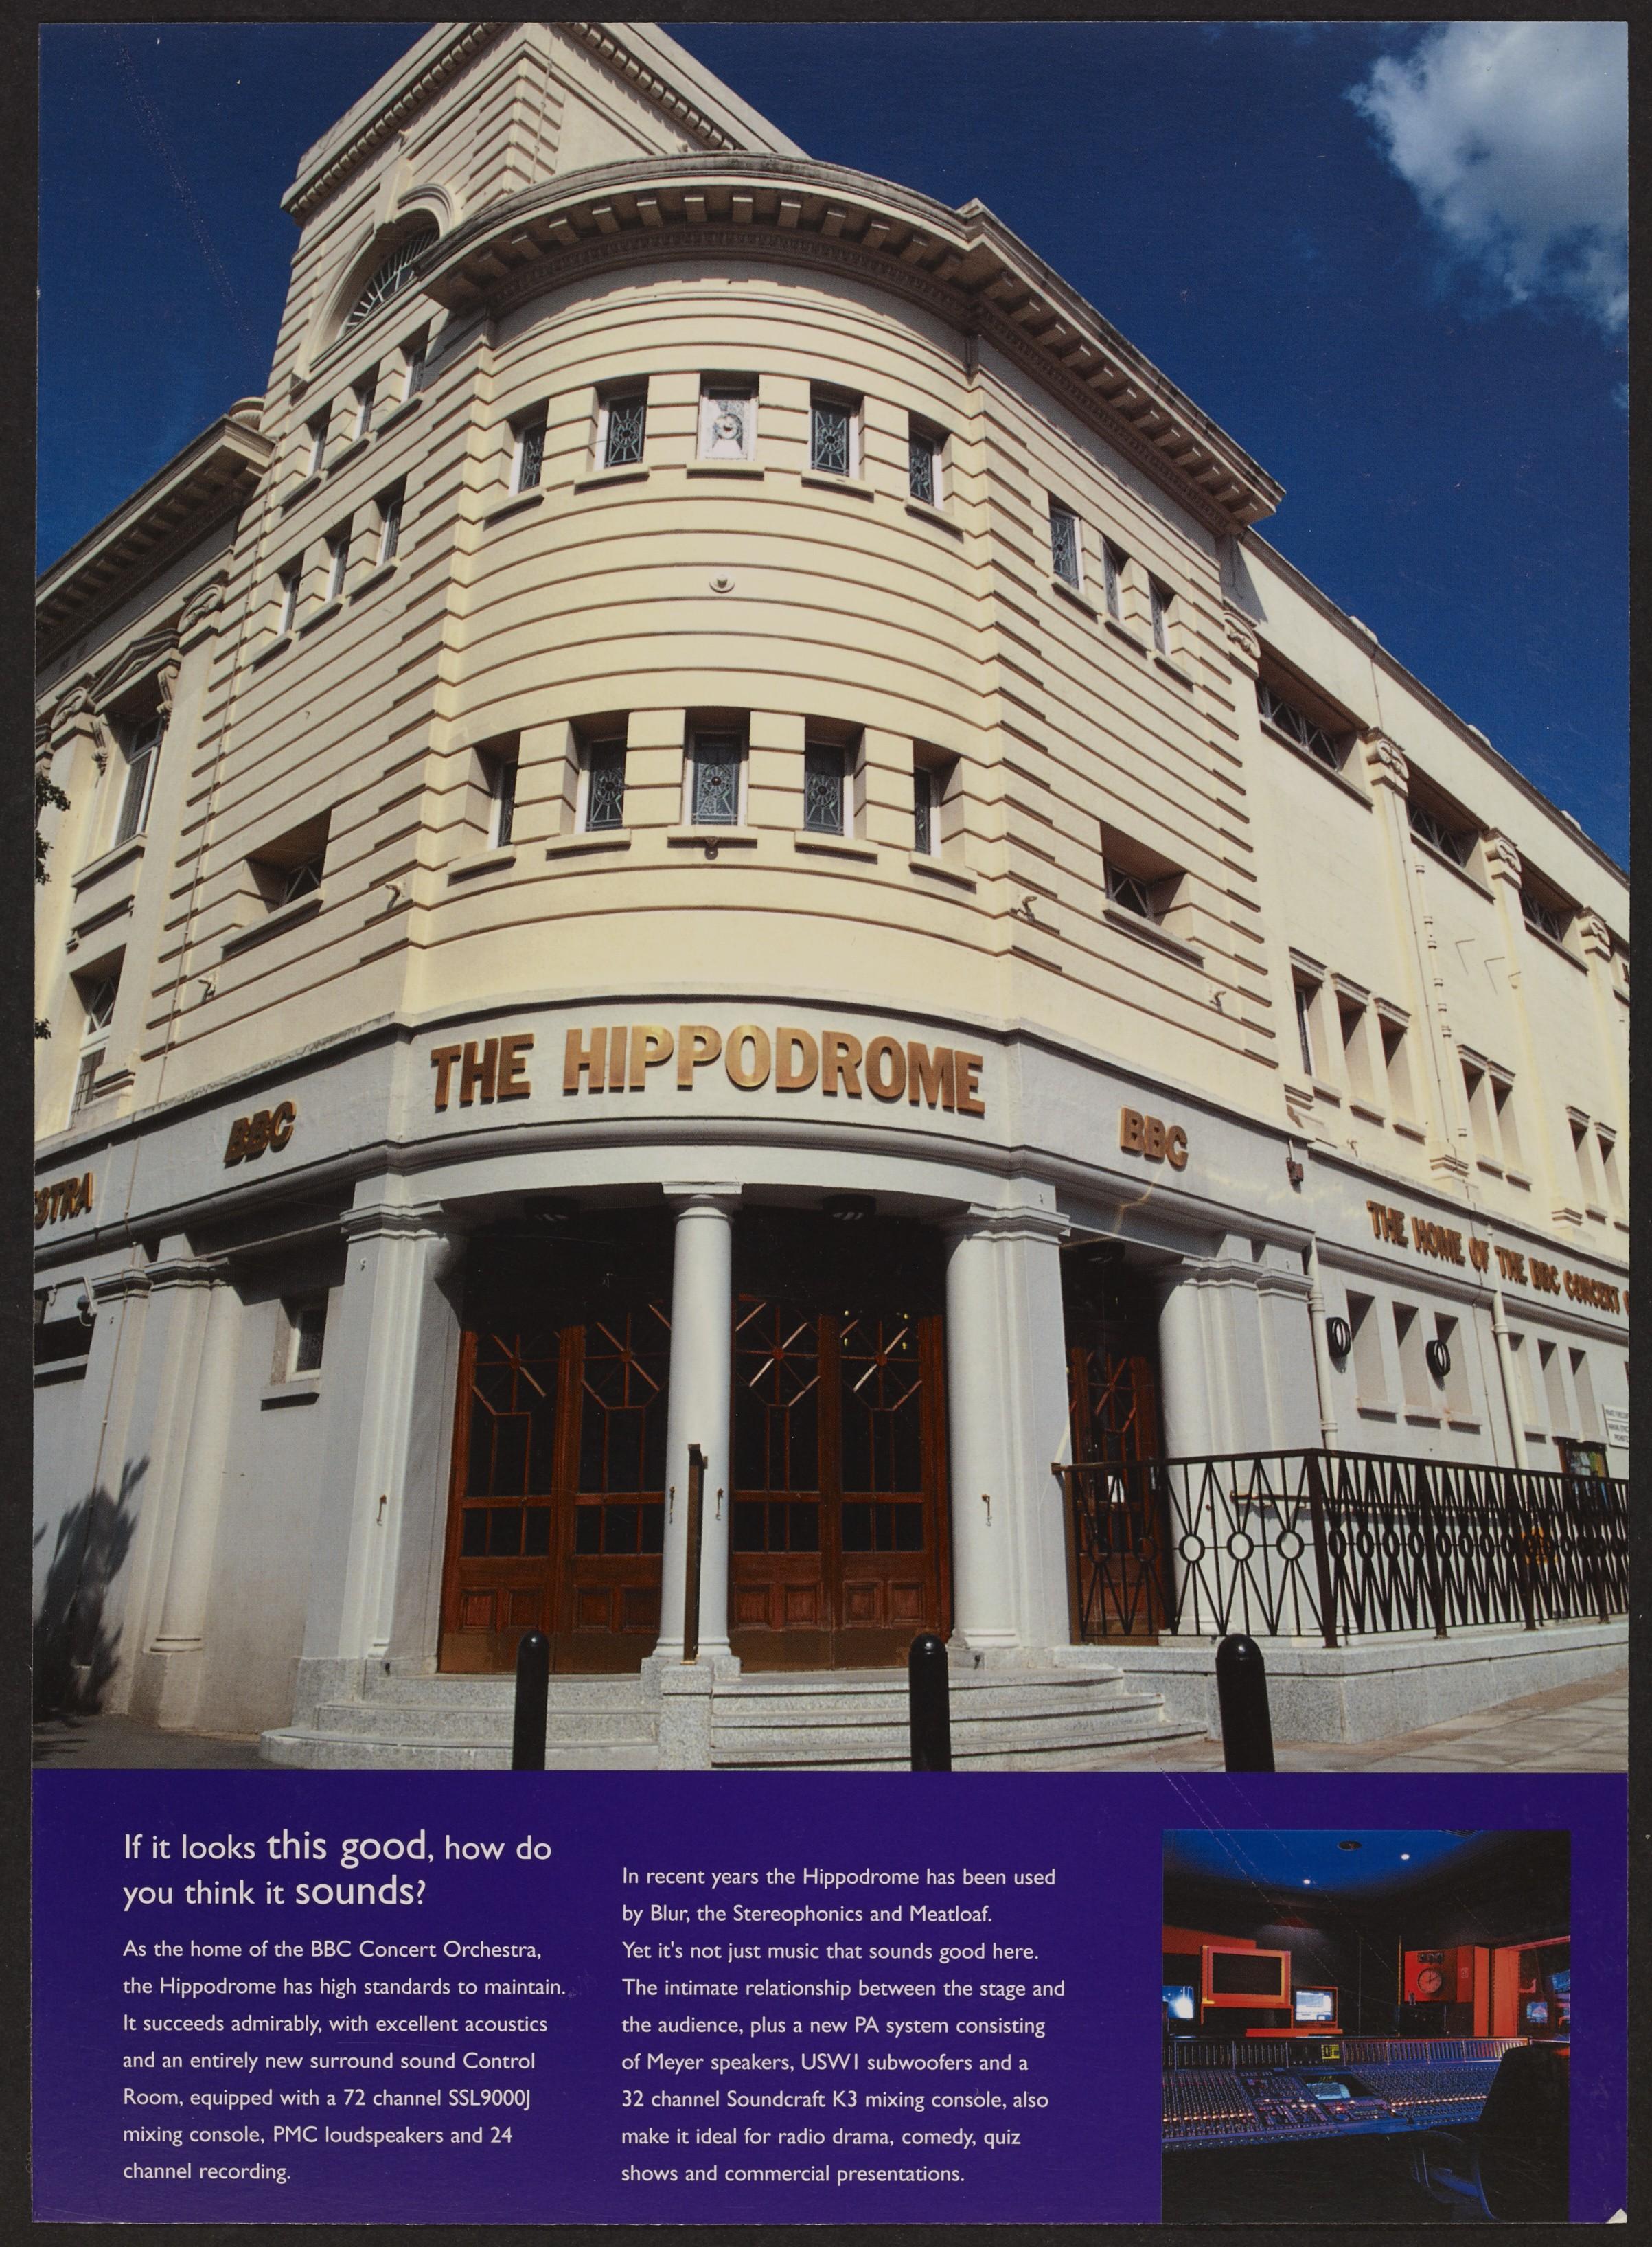 Hippodrome Re-Opens